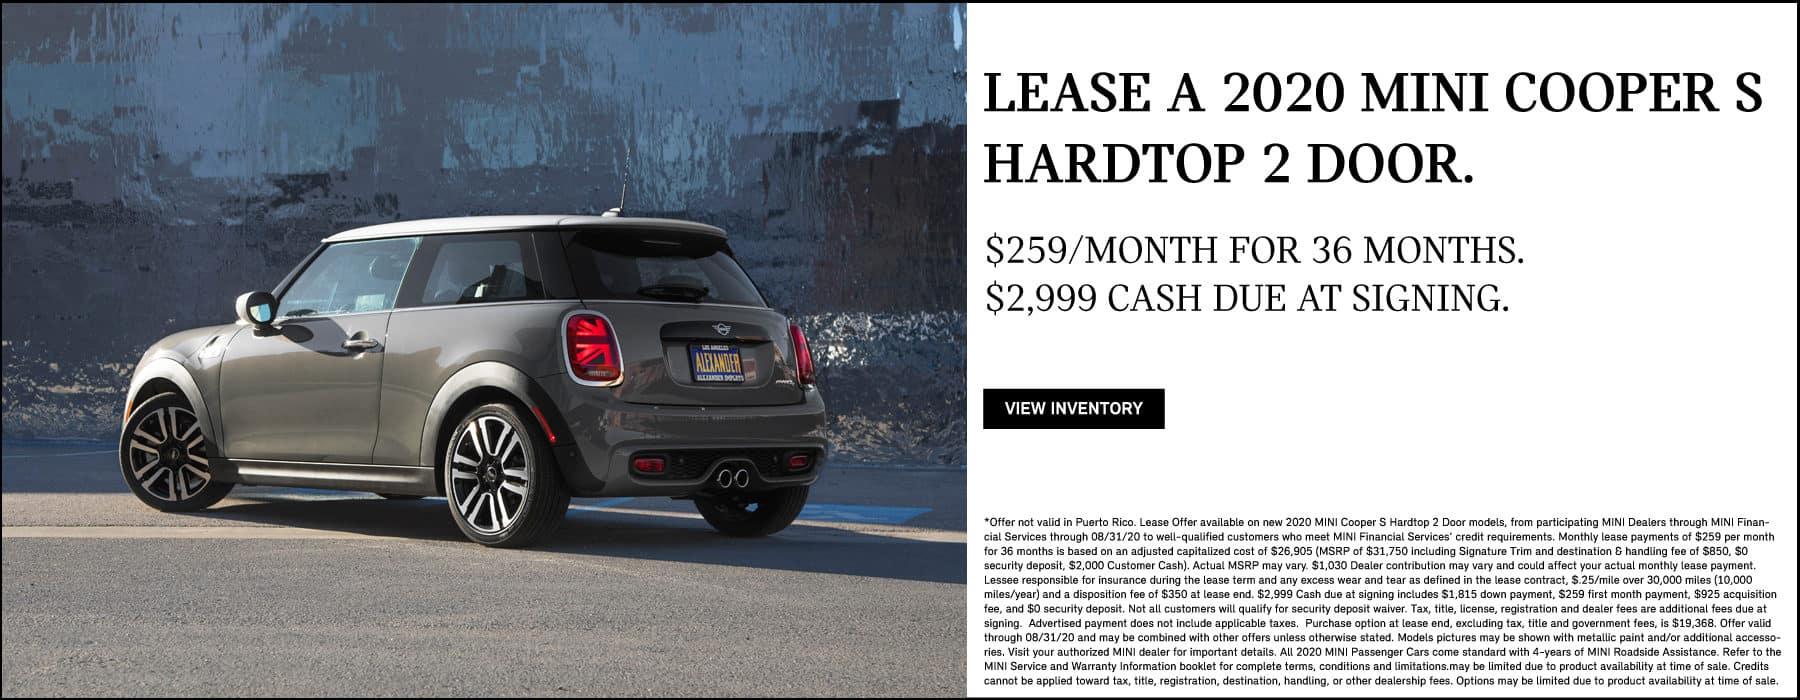 MINI Cooper S Hardtop Countryman Convertible Sale Deal Los Angeles California Valencia Valley Camarillo Steve Thomas Universal Southern LA CALI Lease Price Discount Special